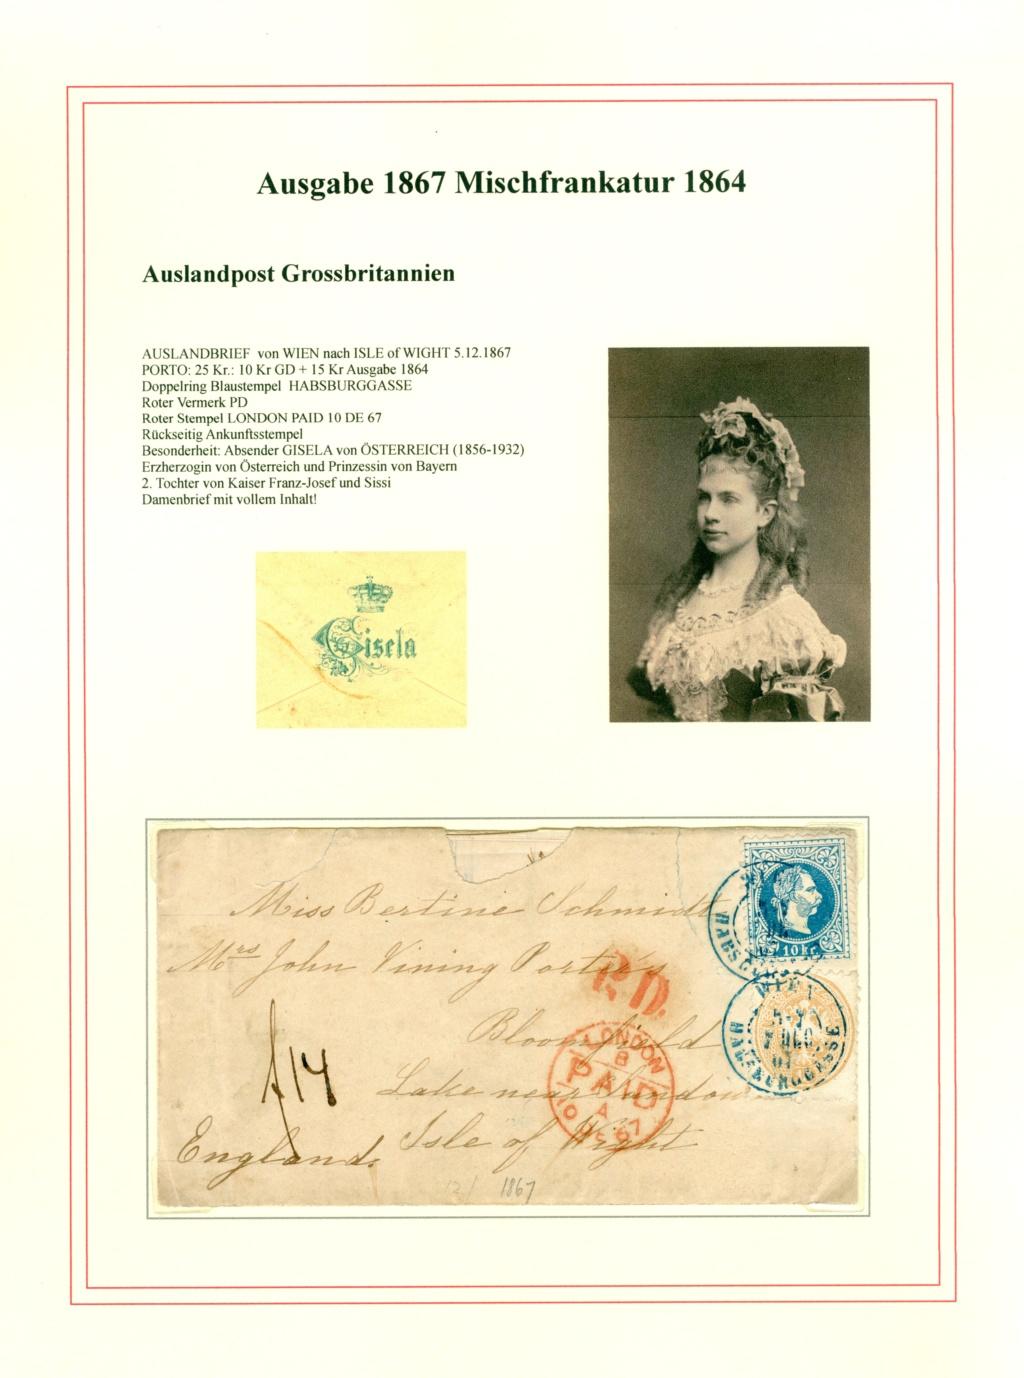 Nachtrag - Freimarken-Ausgabe 1867 : Kopfbildnis Kaiser Franz Joseph I - Seite 23 Gisela12